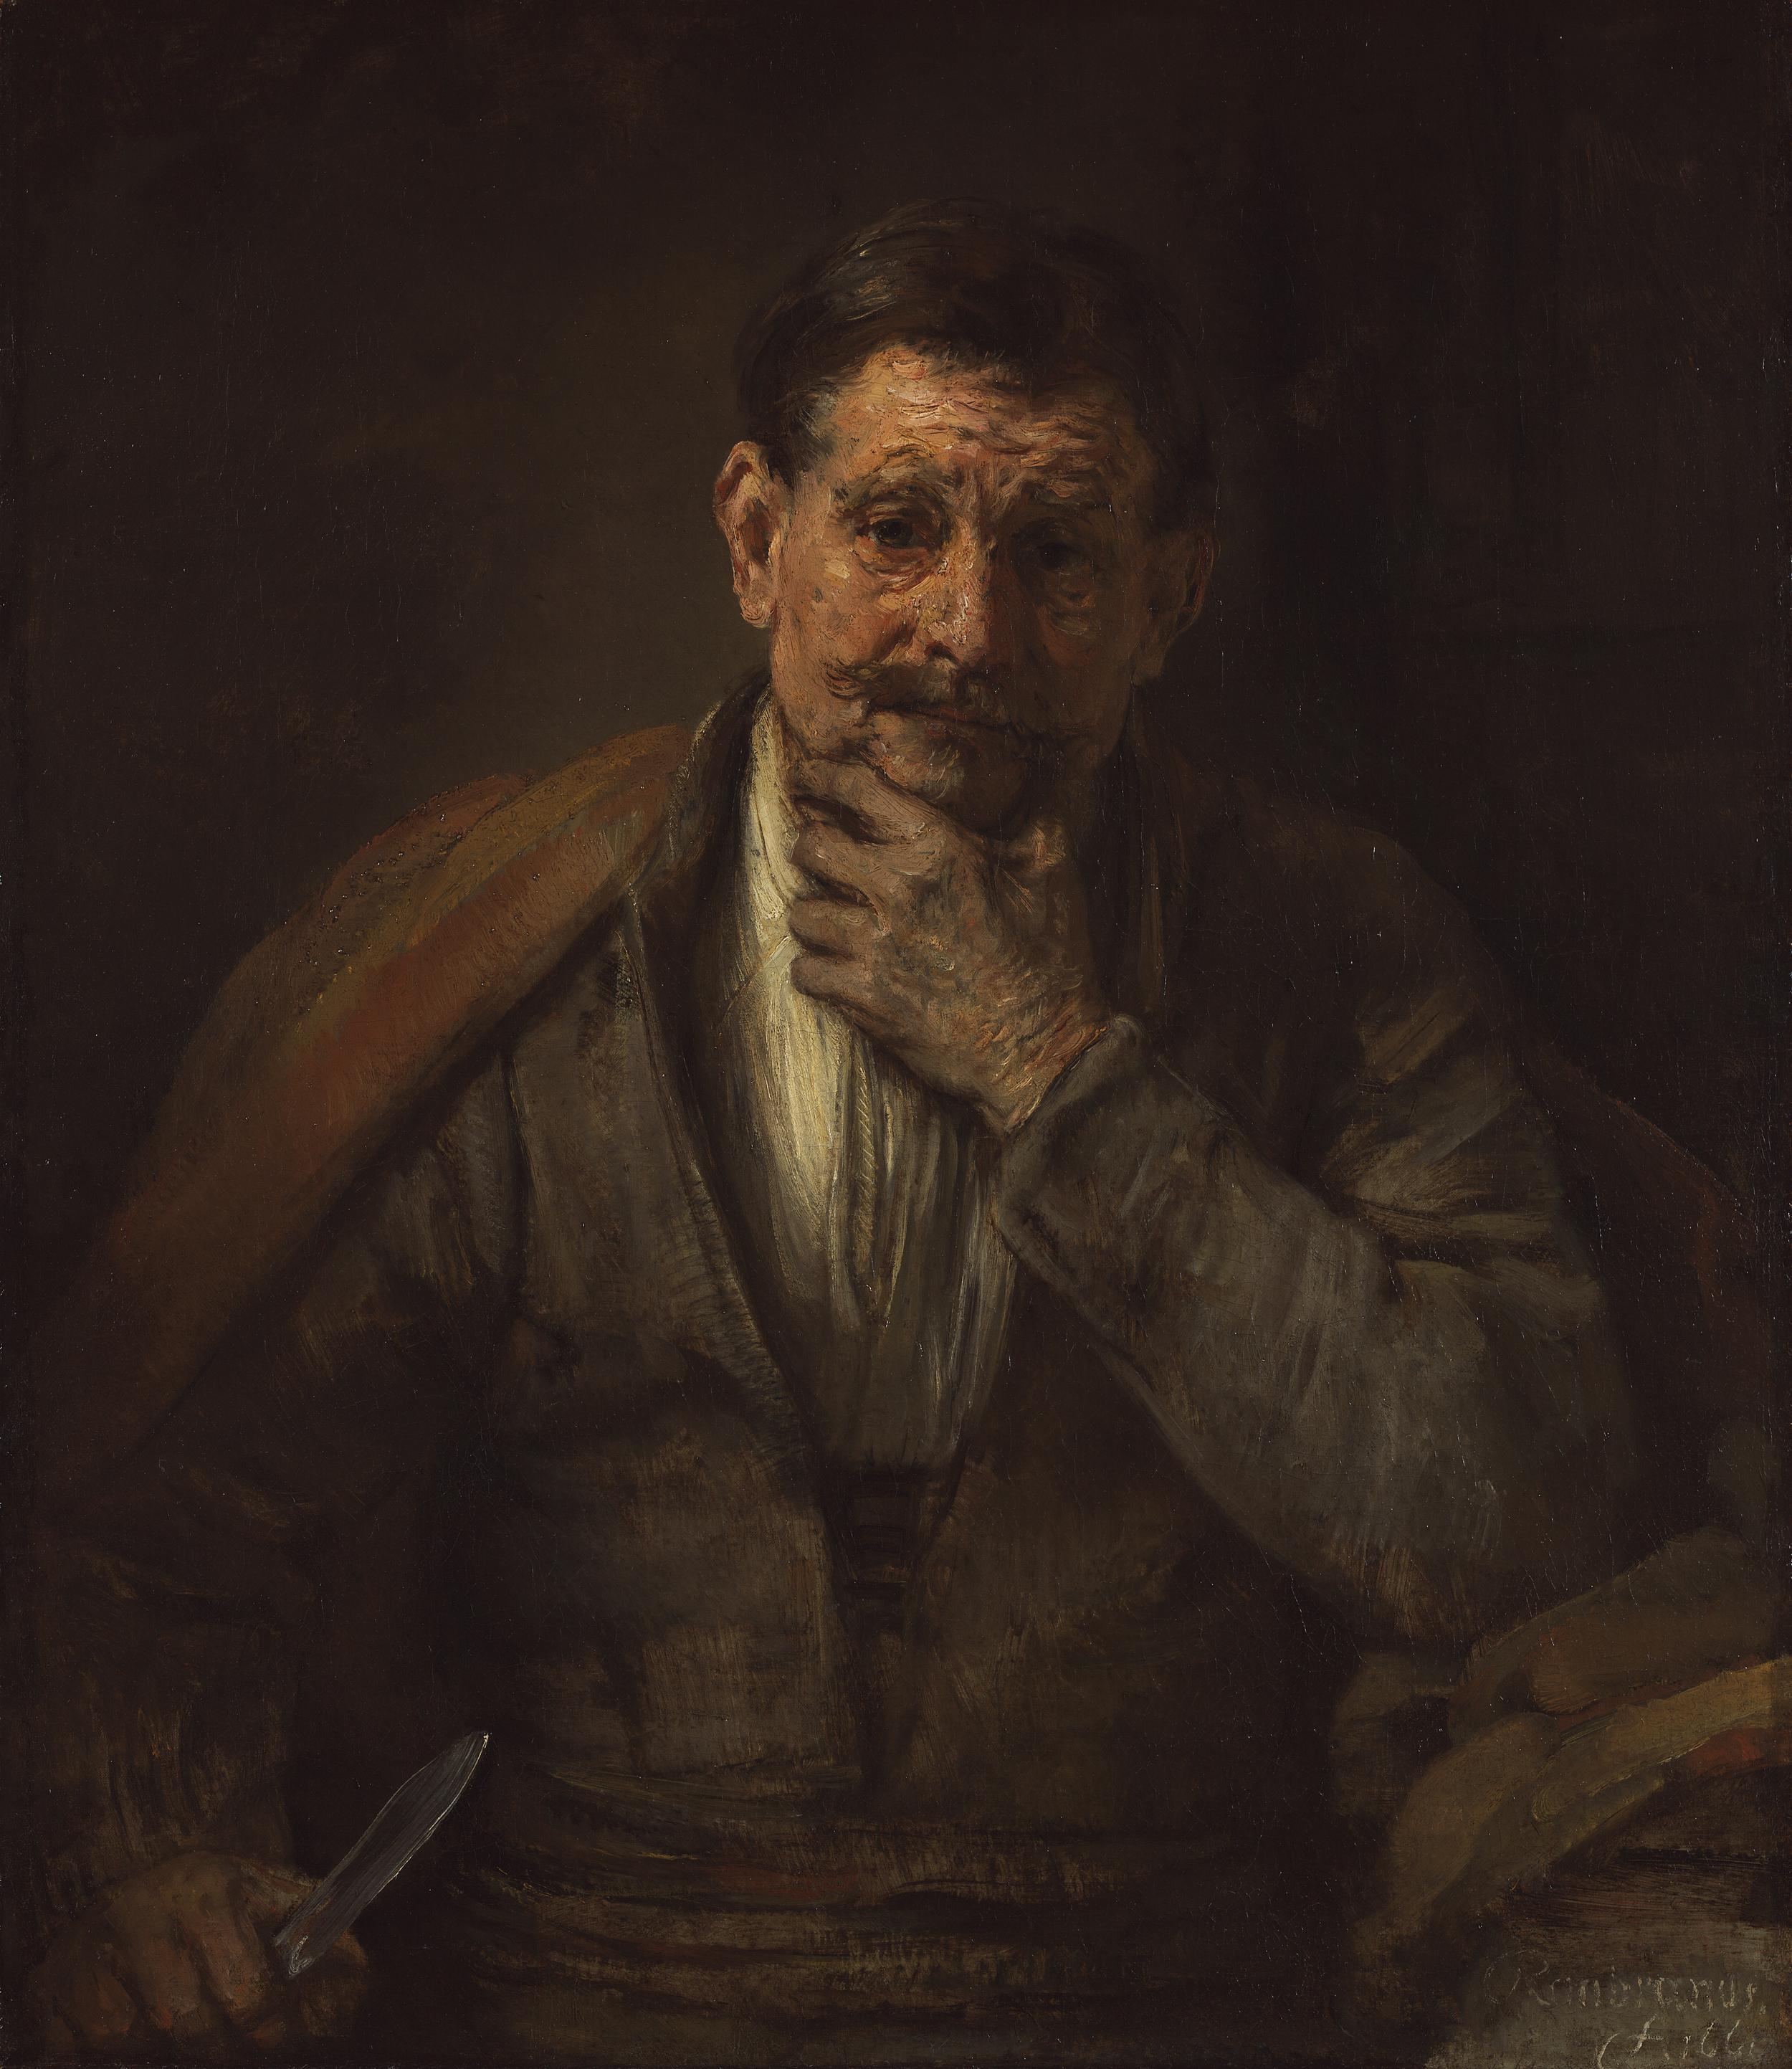 Rembrandt Harmensz. van Rijn (Dutch, 1606 - 1669)   St. Bartholomew  , 1661, Oil on canvas   86.7 x 75.6 cm (34 1/8 x 29 3/4 in.)   The J. Paul Getty Museum, Los Angeles